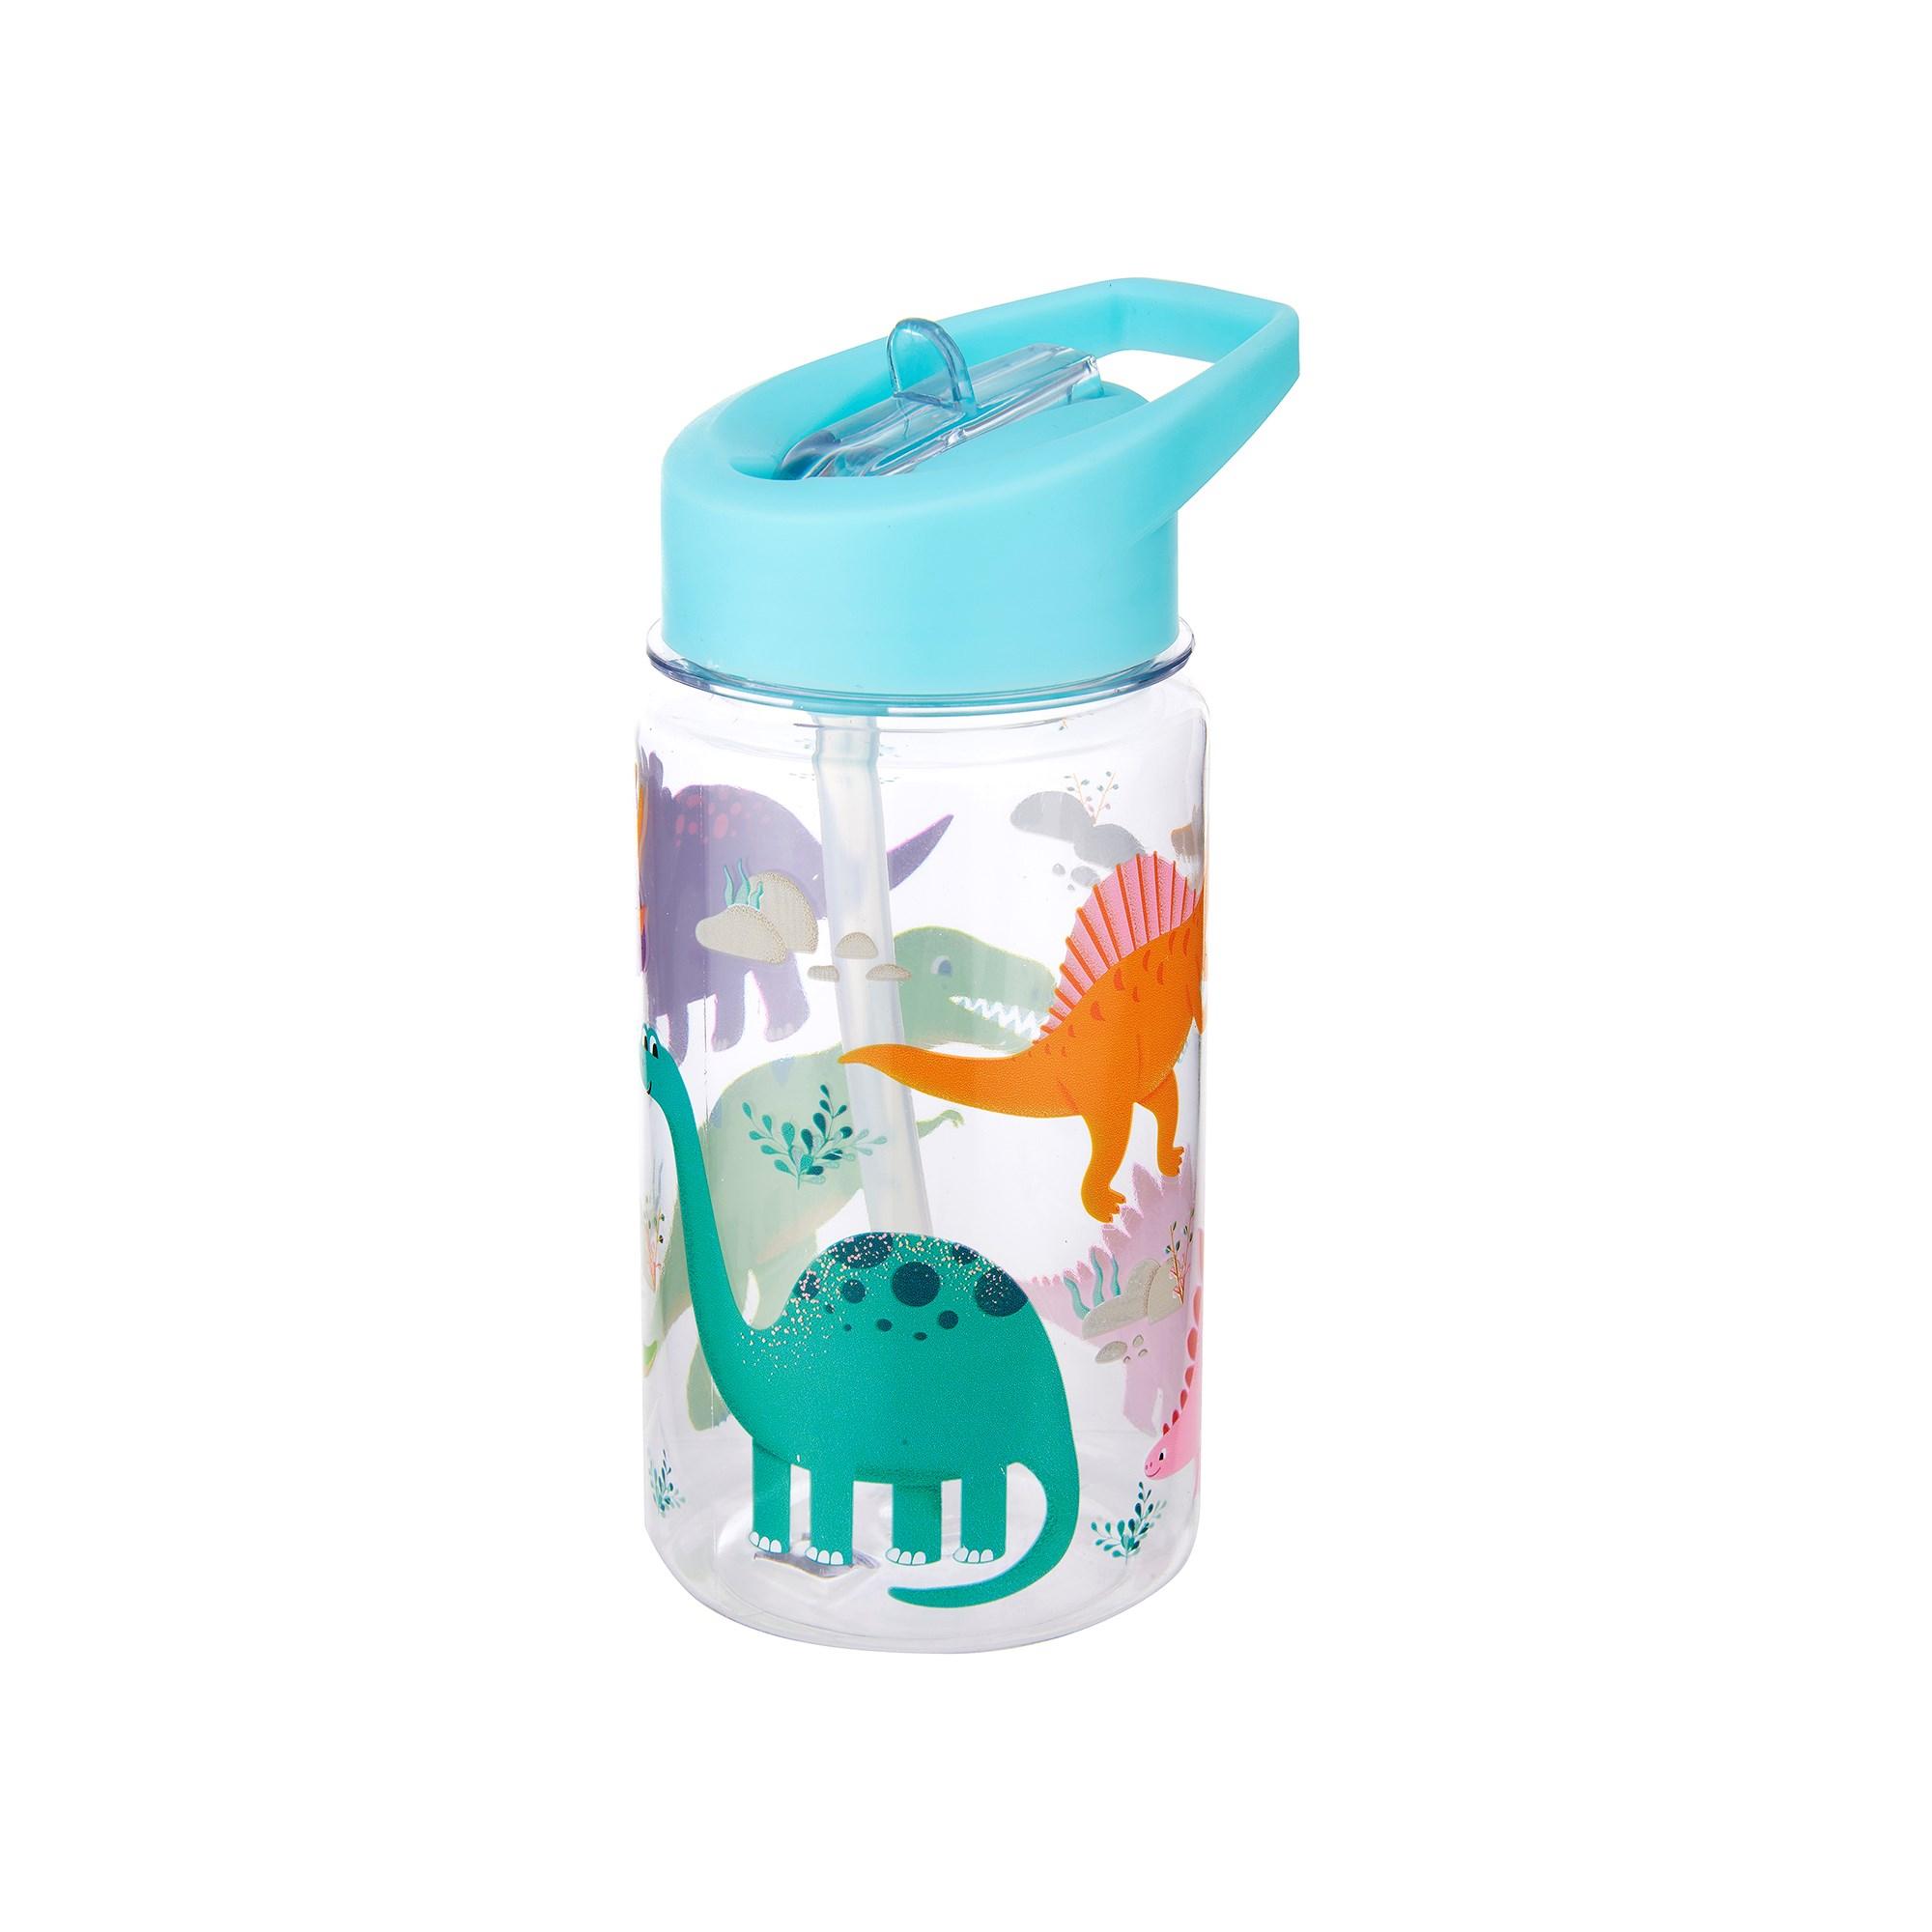 Dinosaur Children's Water Bottle